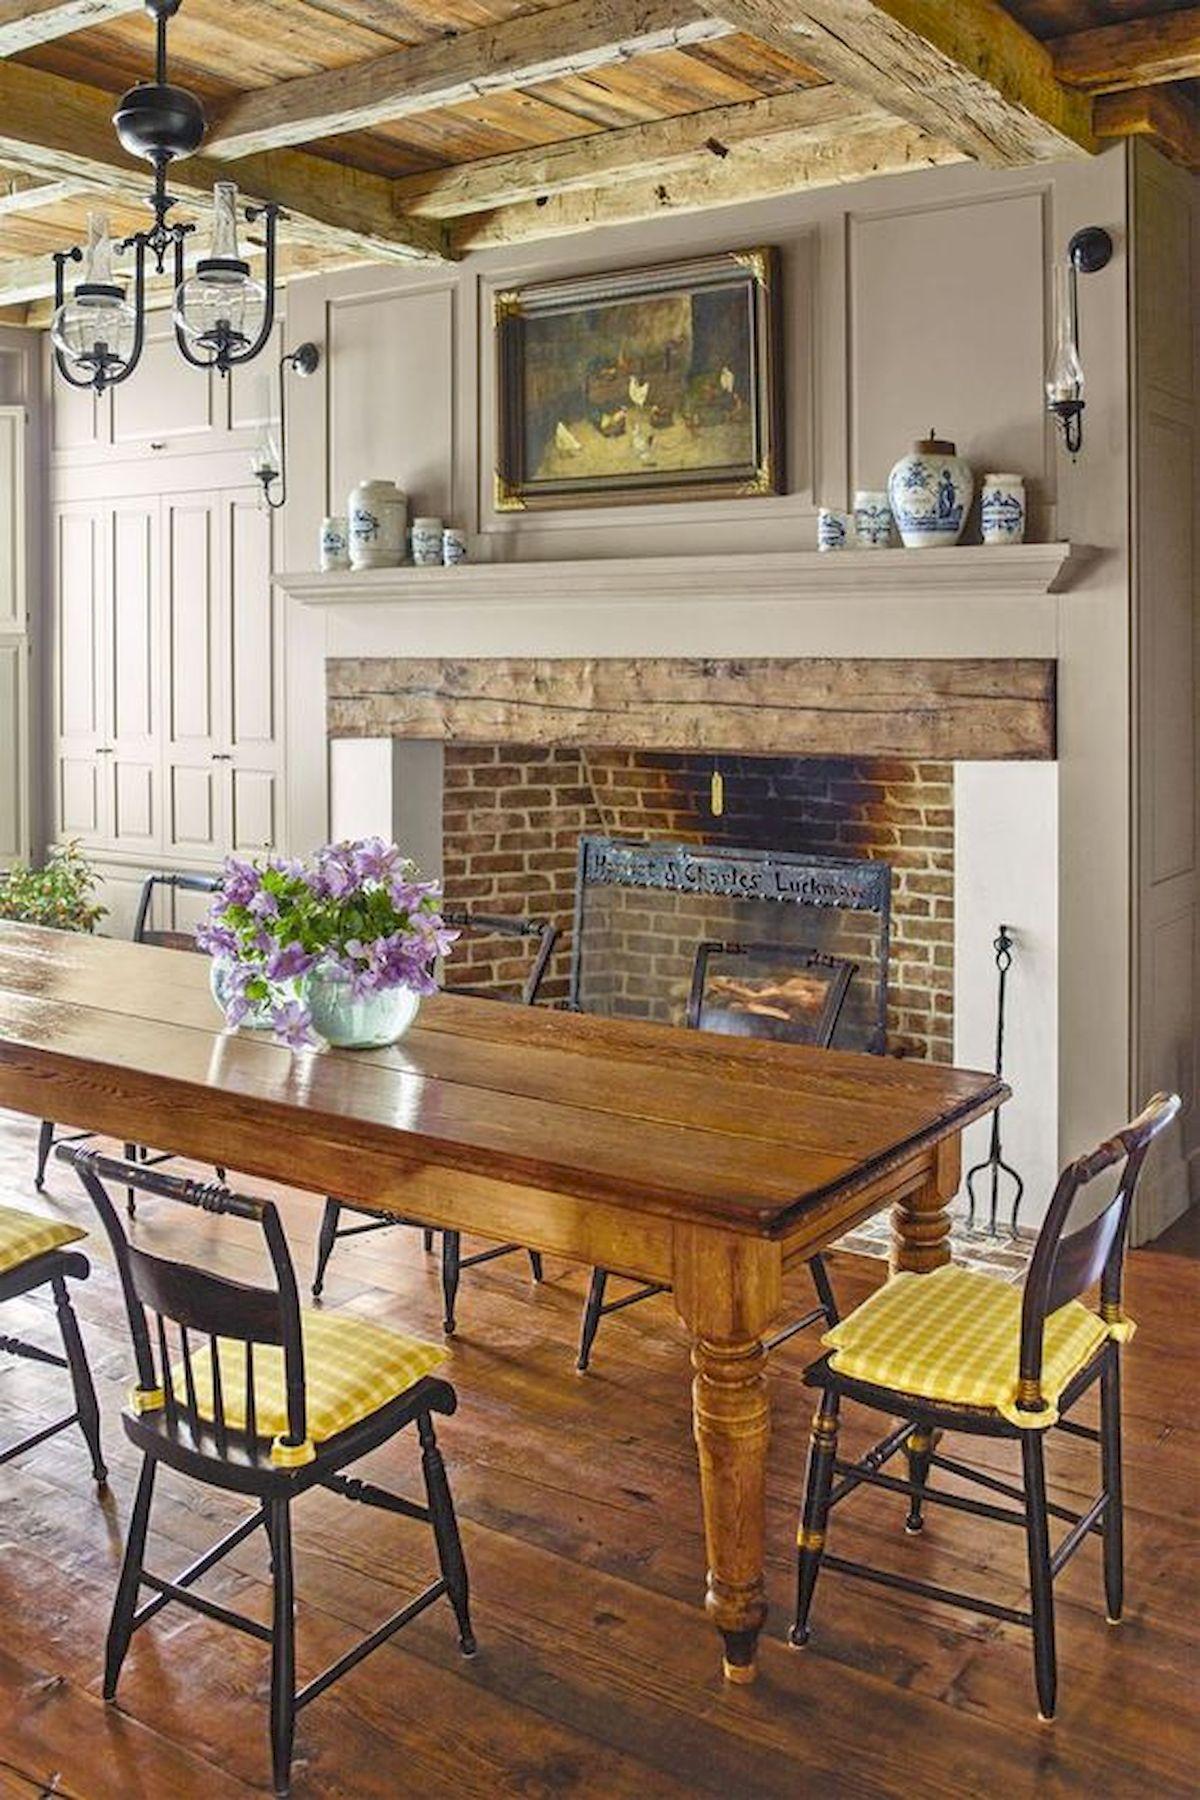 40 Adorable Farmhouse Dining Room Design And Decor Ideas (14)